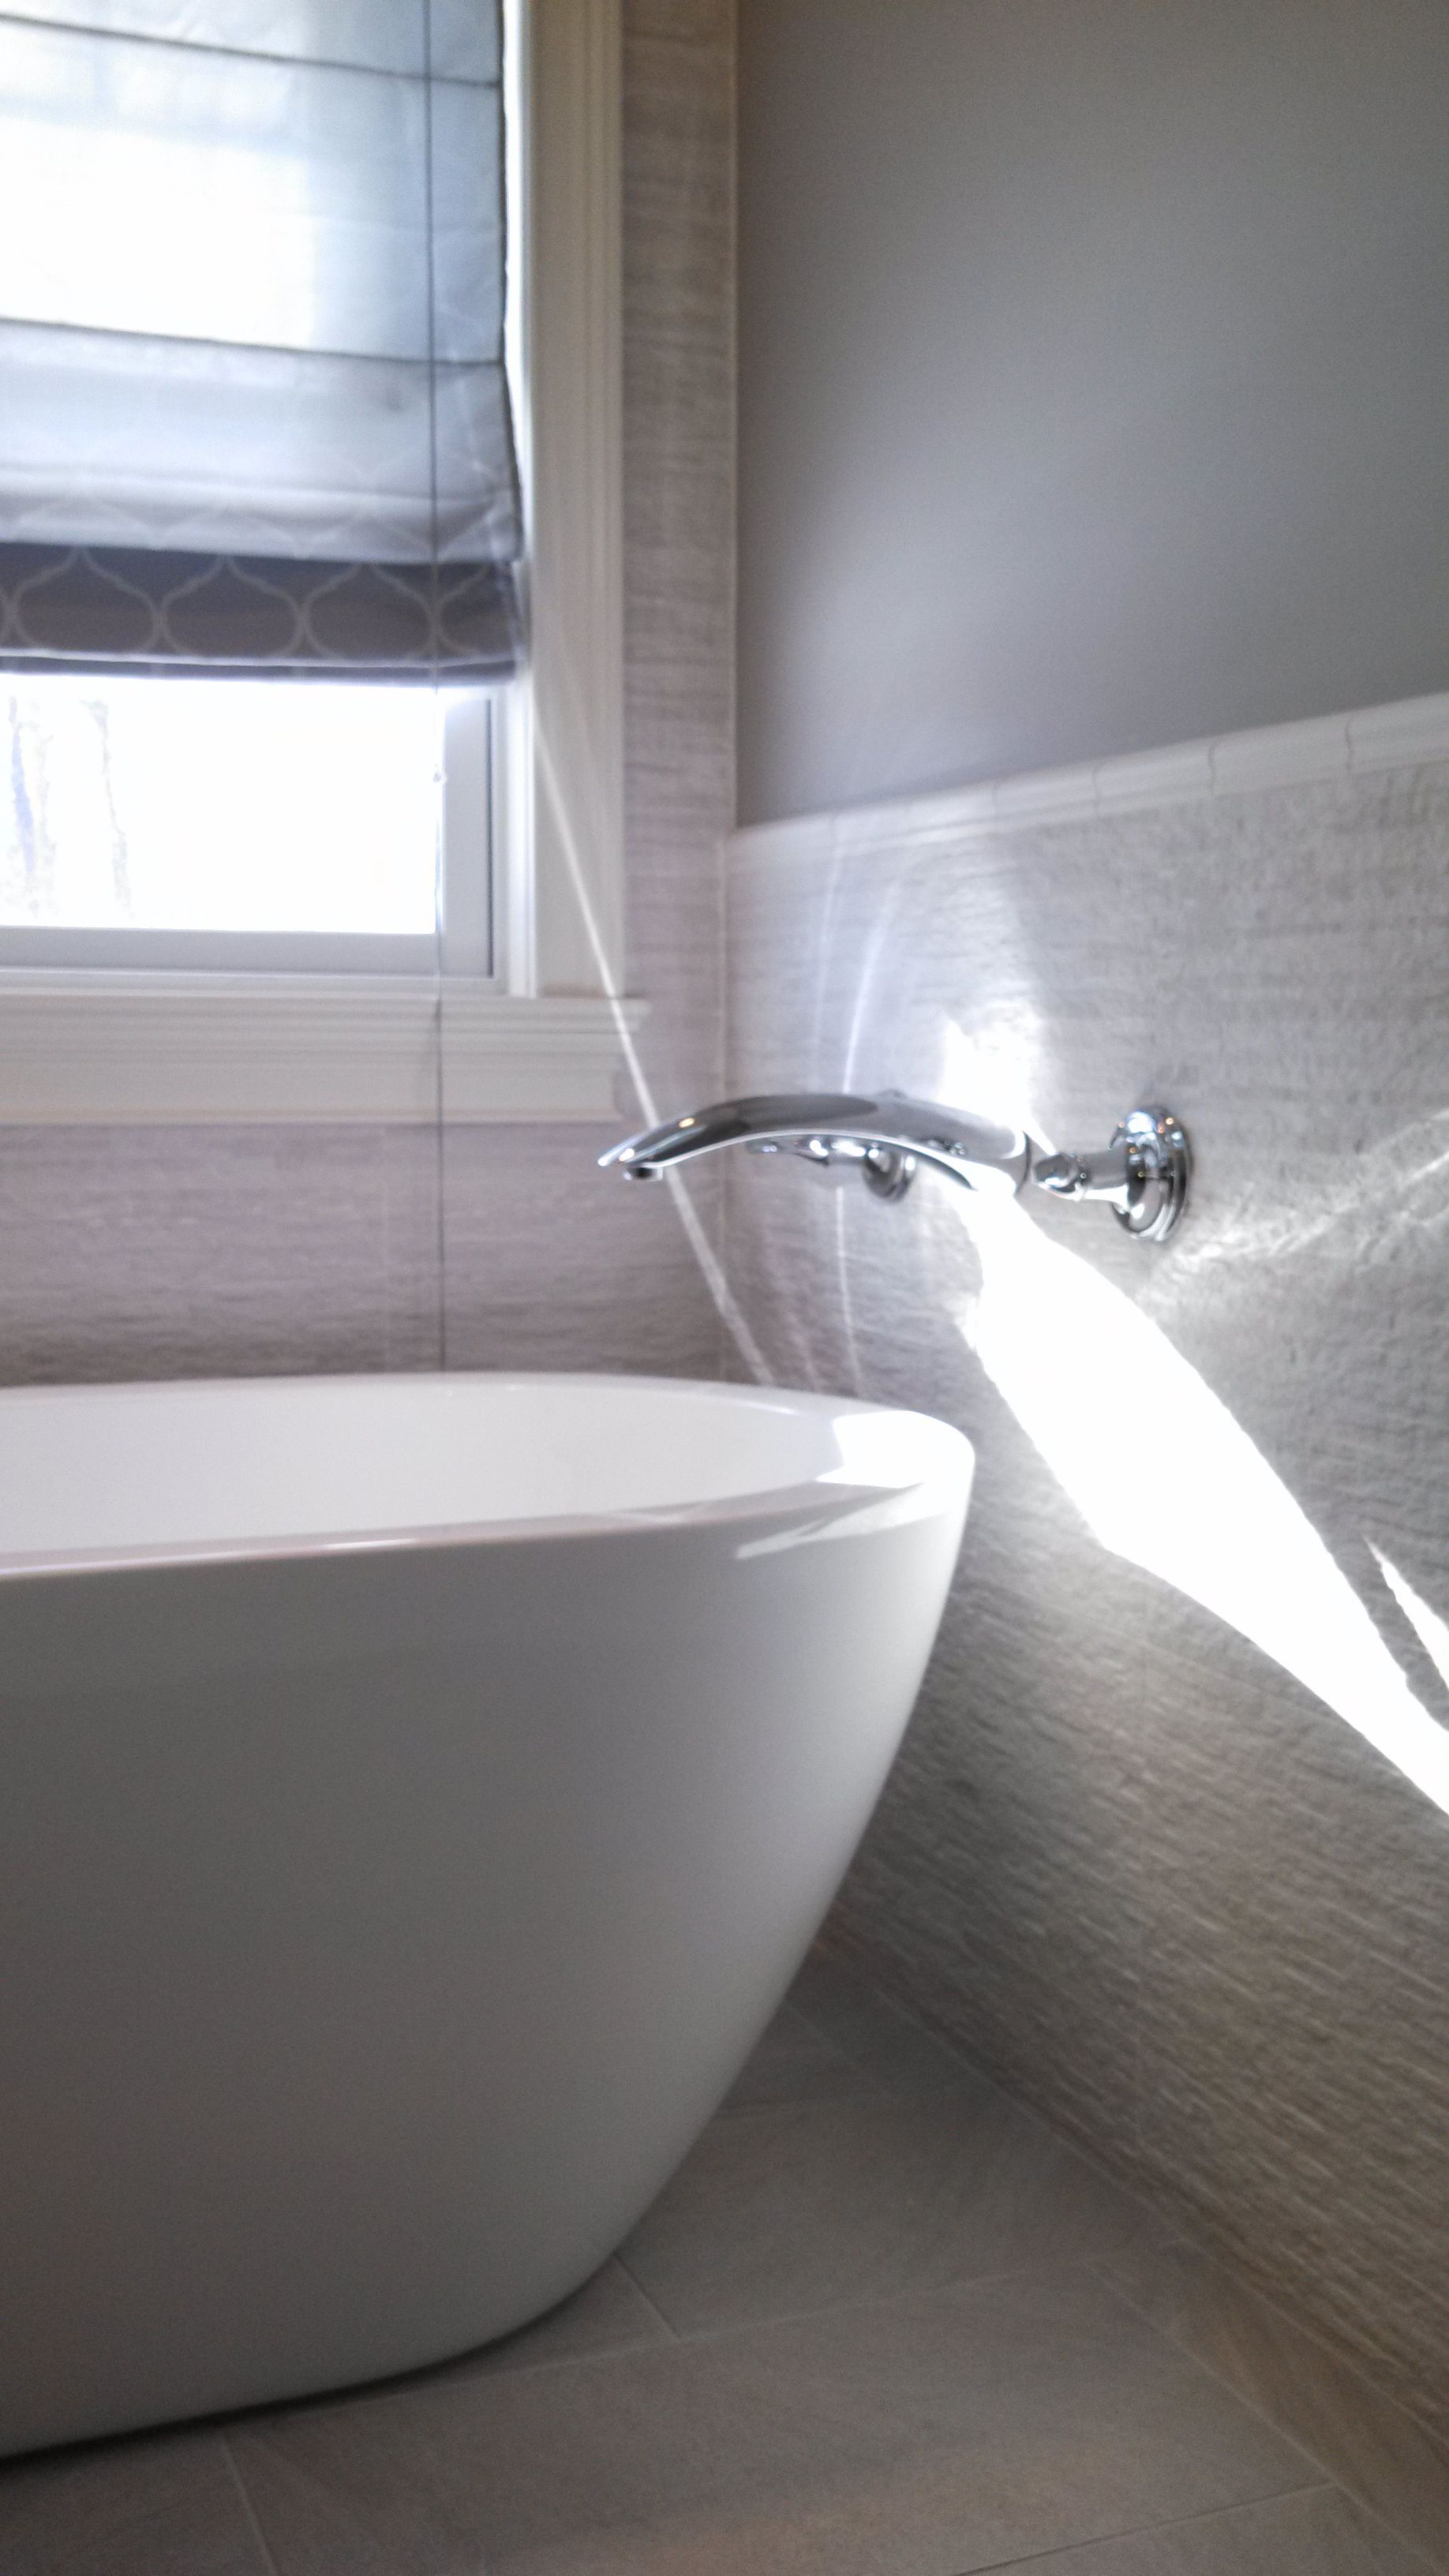 Designer Donna Triolo Mid America Tile Elk Grove Village Il Master Bathroom Floor Piemme Purestone Grey 12 X 24 Field With Mapei Ultracolor Warm